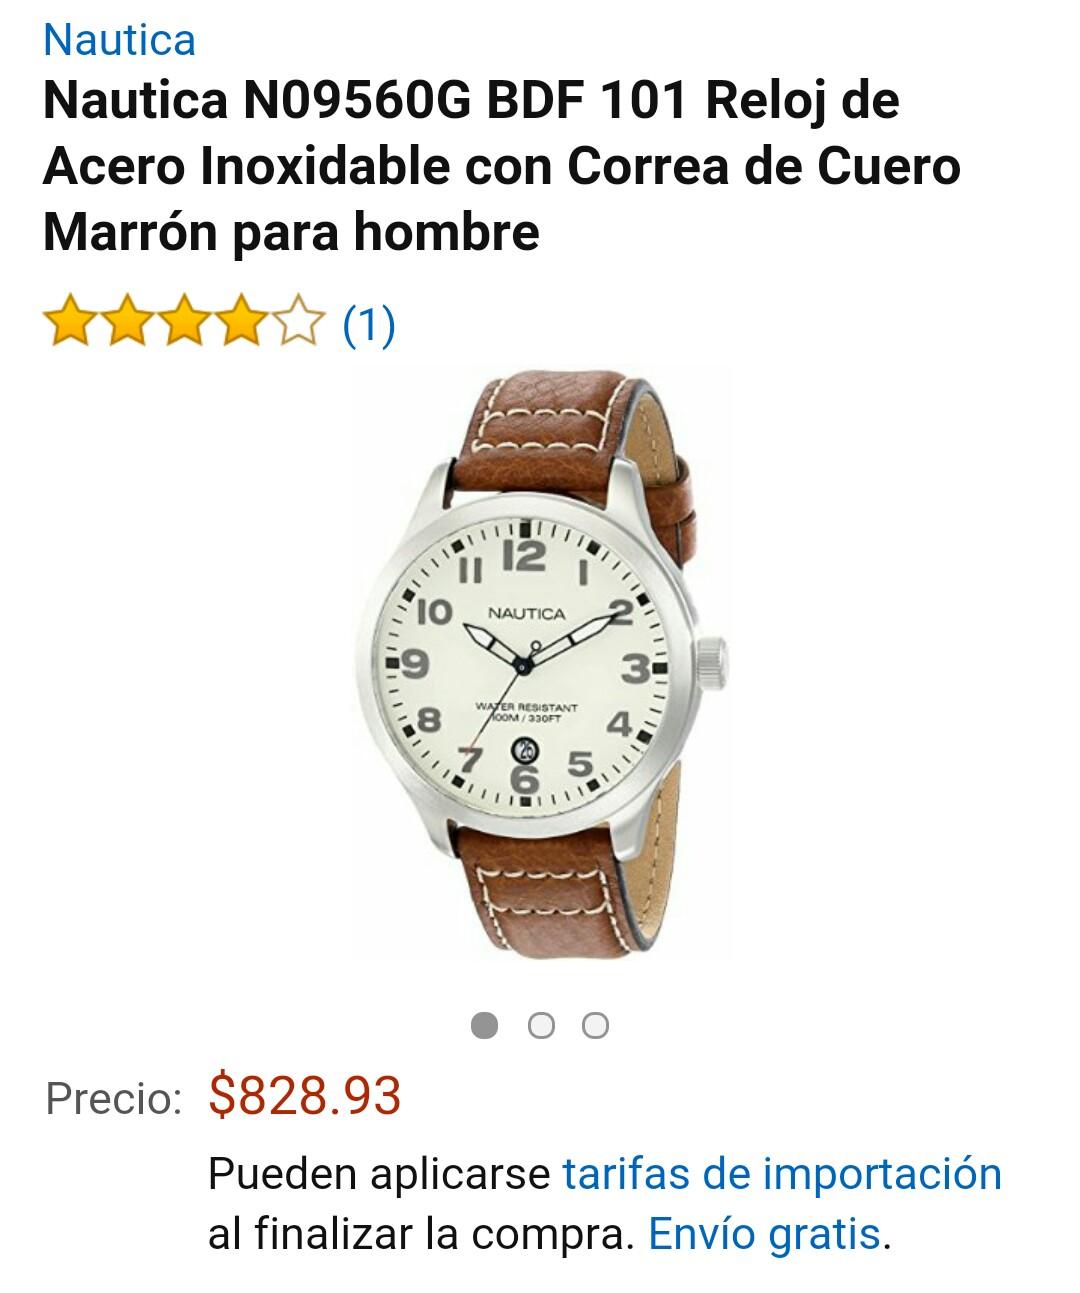 Amazon: Reloj de Acero Inoxidable Nautica N09560G a $828